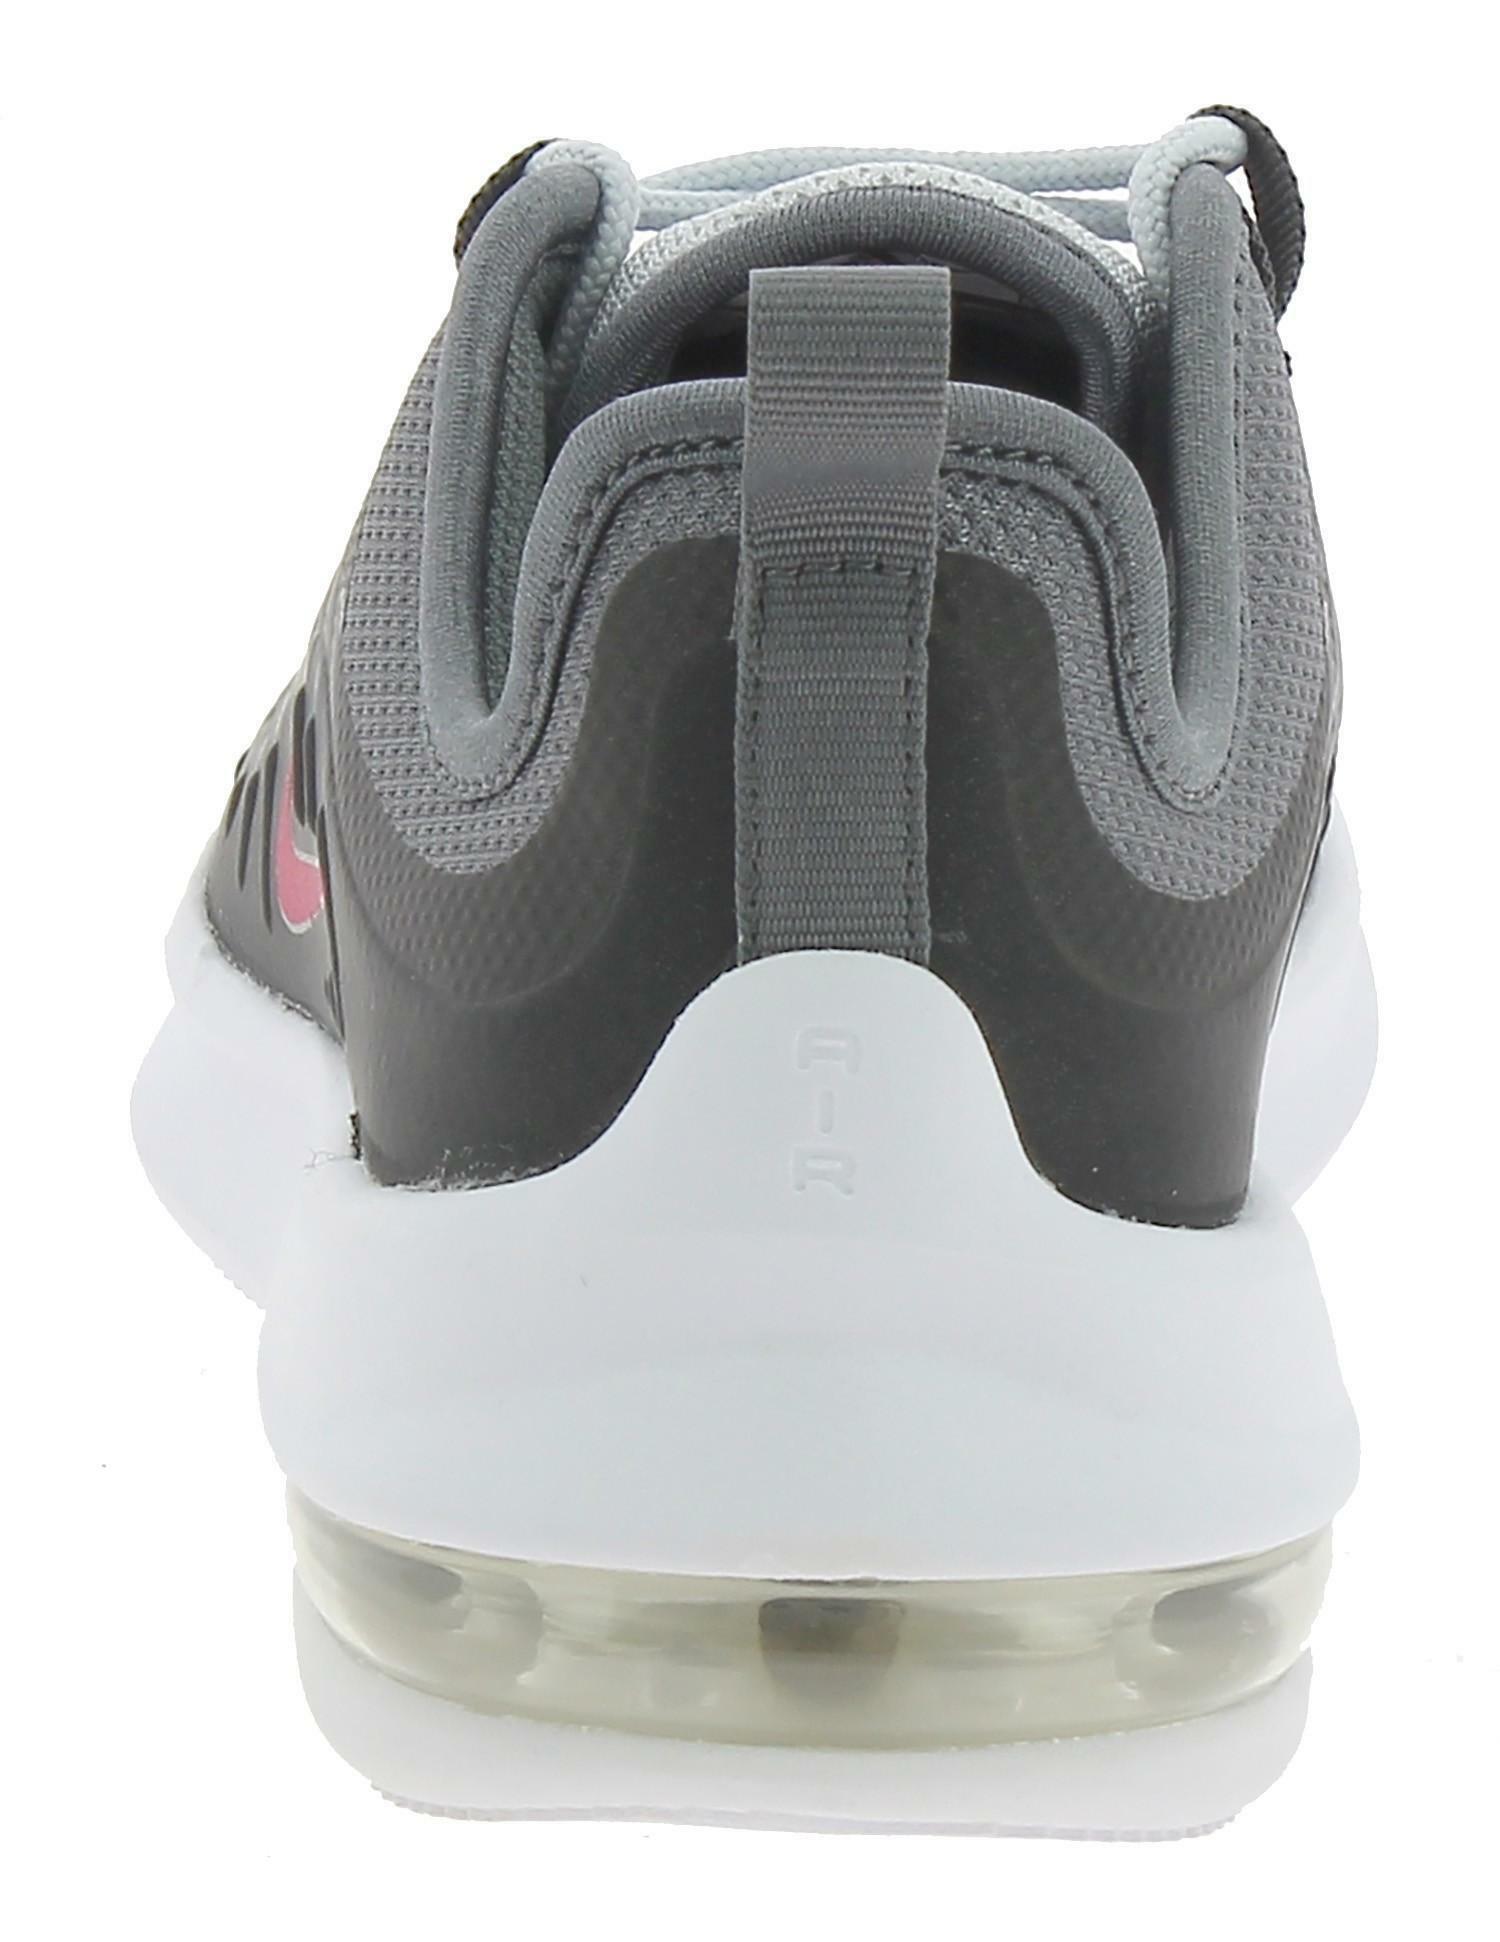 nike nike air max axis scarpe sportive grigie ah5225001